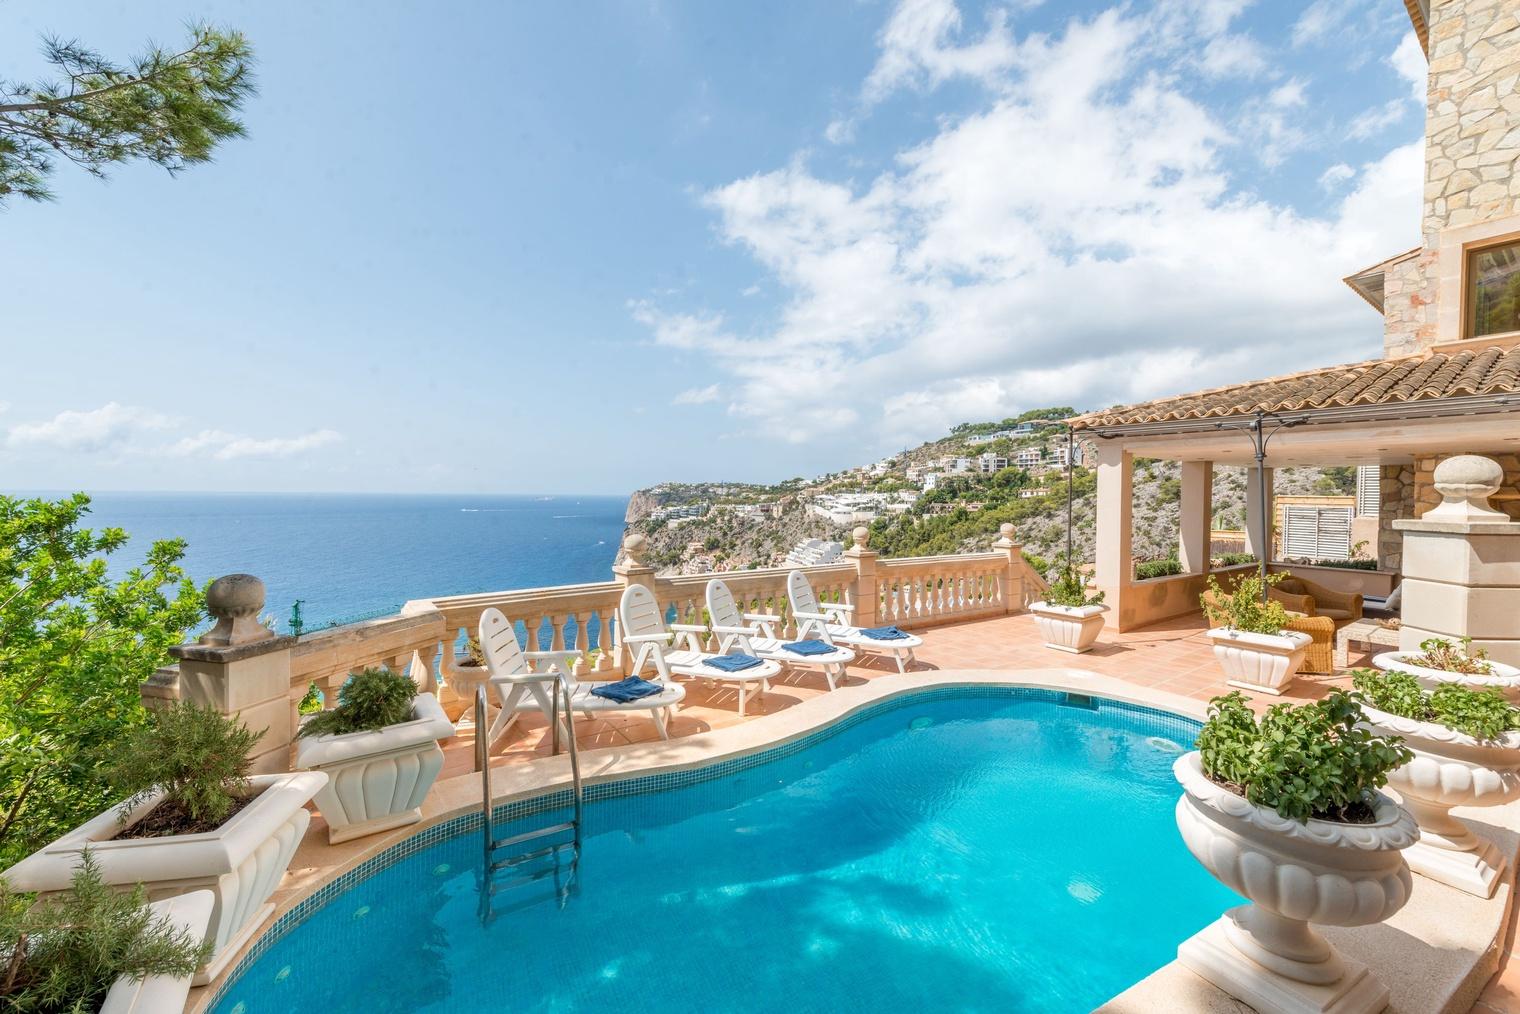 Direkt am Meer mit Panoramablick Villa Cala Llamp